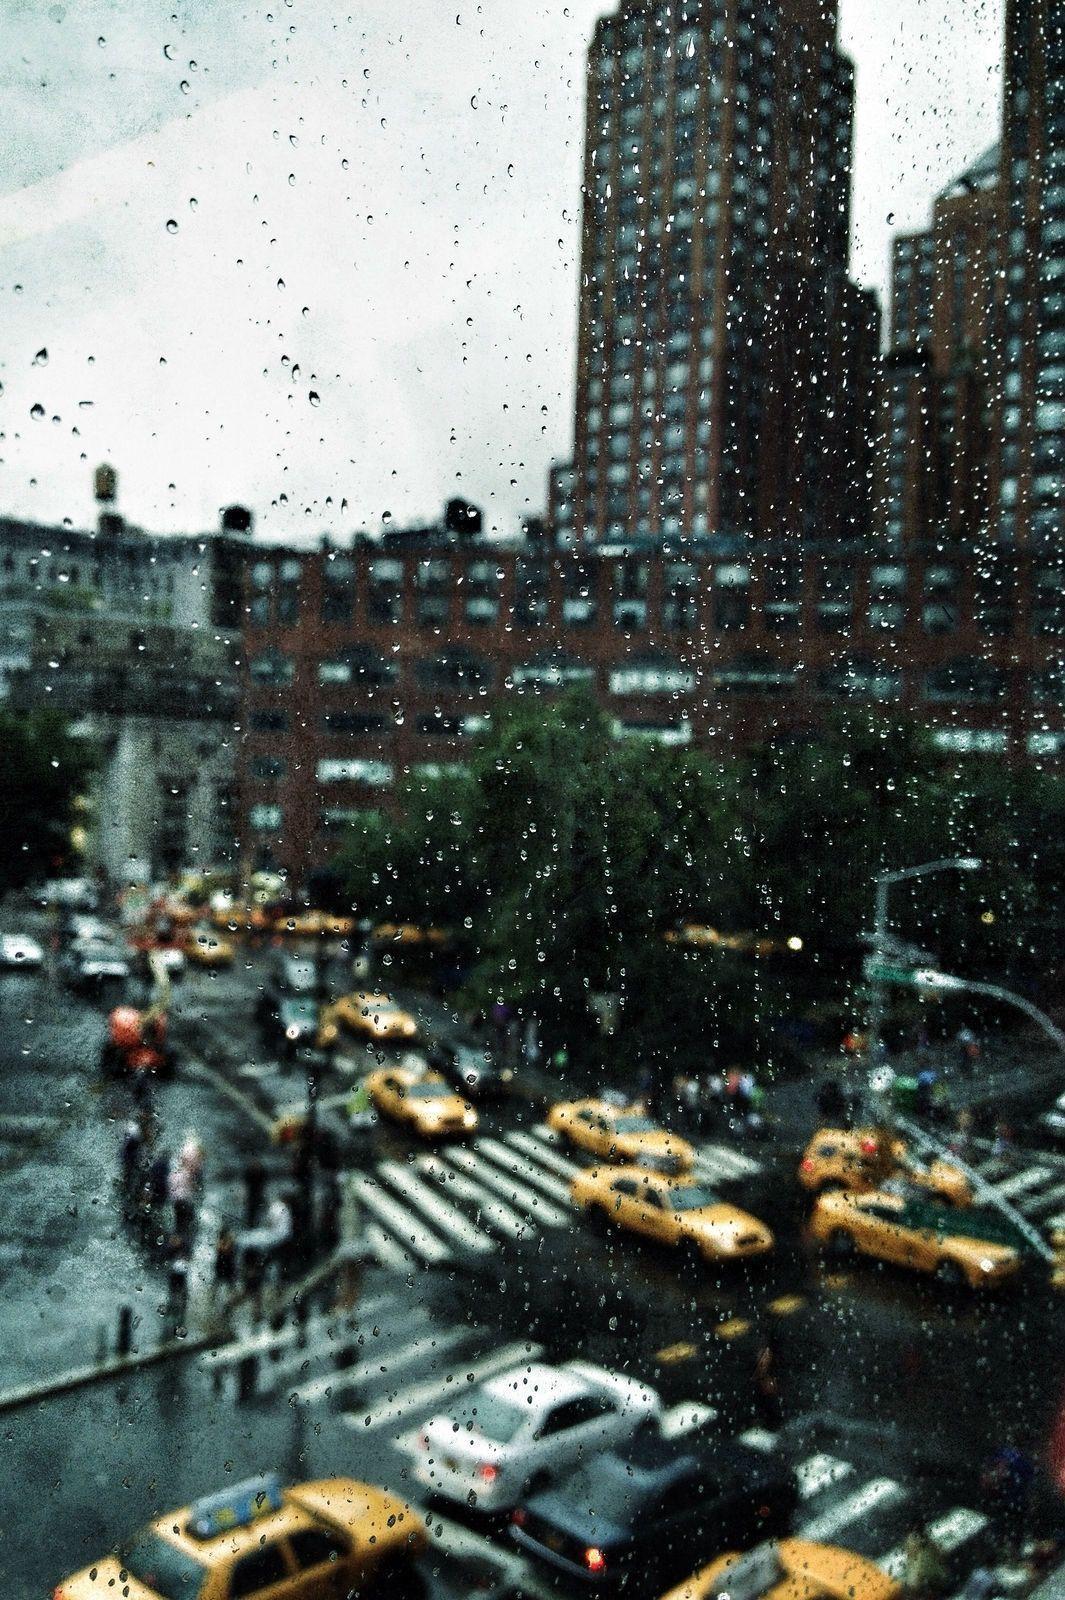 Rainy New York Iphone Wallpapers Top Free Rainy New York